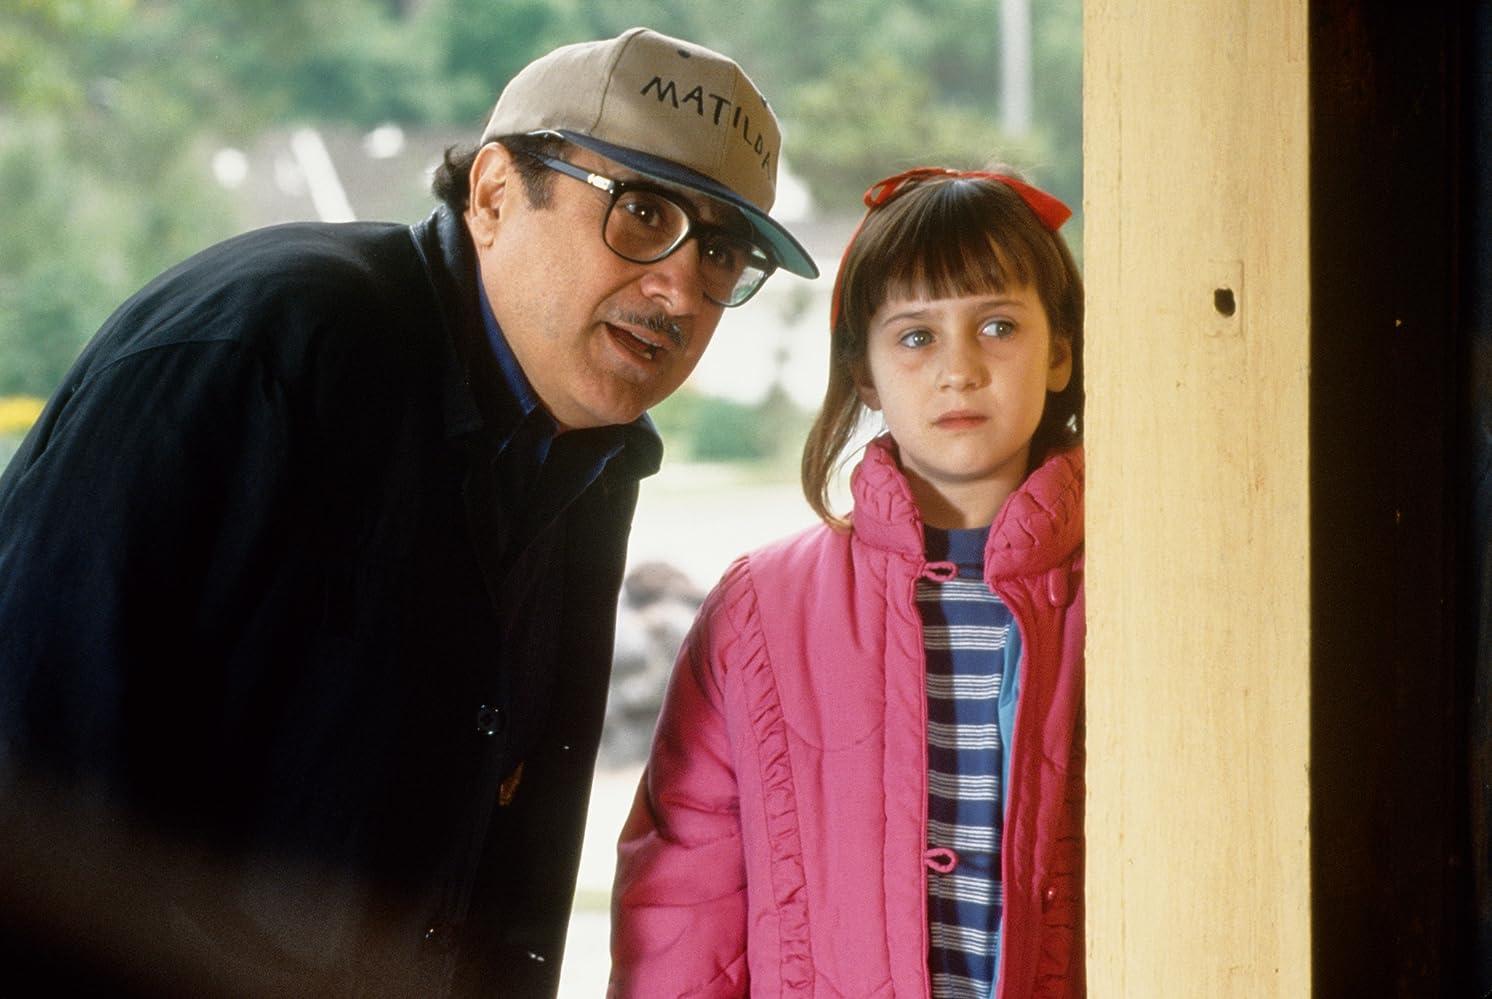 film analysis matilda (matilda le film) les acteurs en français de matilda sont : danny devito (vf : philippematilda (1996) - escape from trunchbull scene (6/10) | movieclips - продолжительность: 3:43.